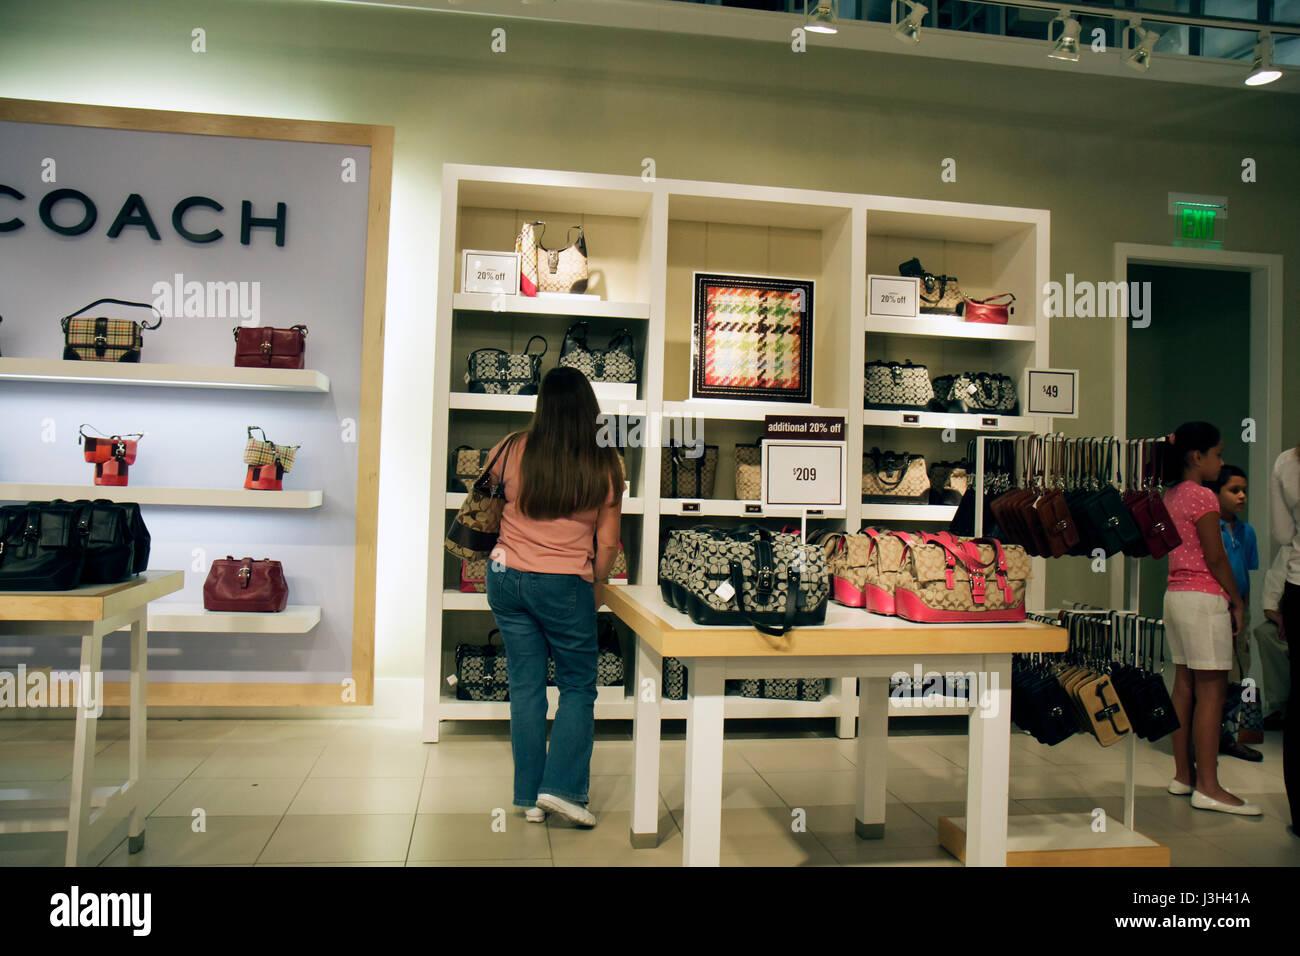 Coach Factory Stock Photos & Coach Factory Stock Images - Alamy